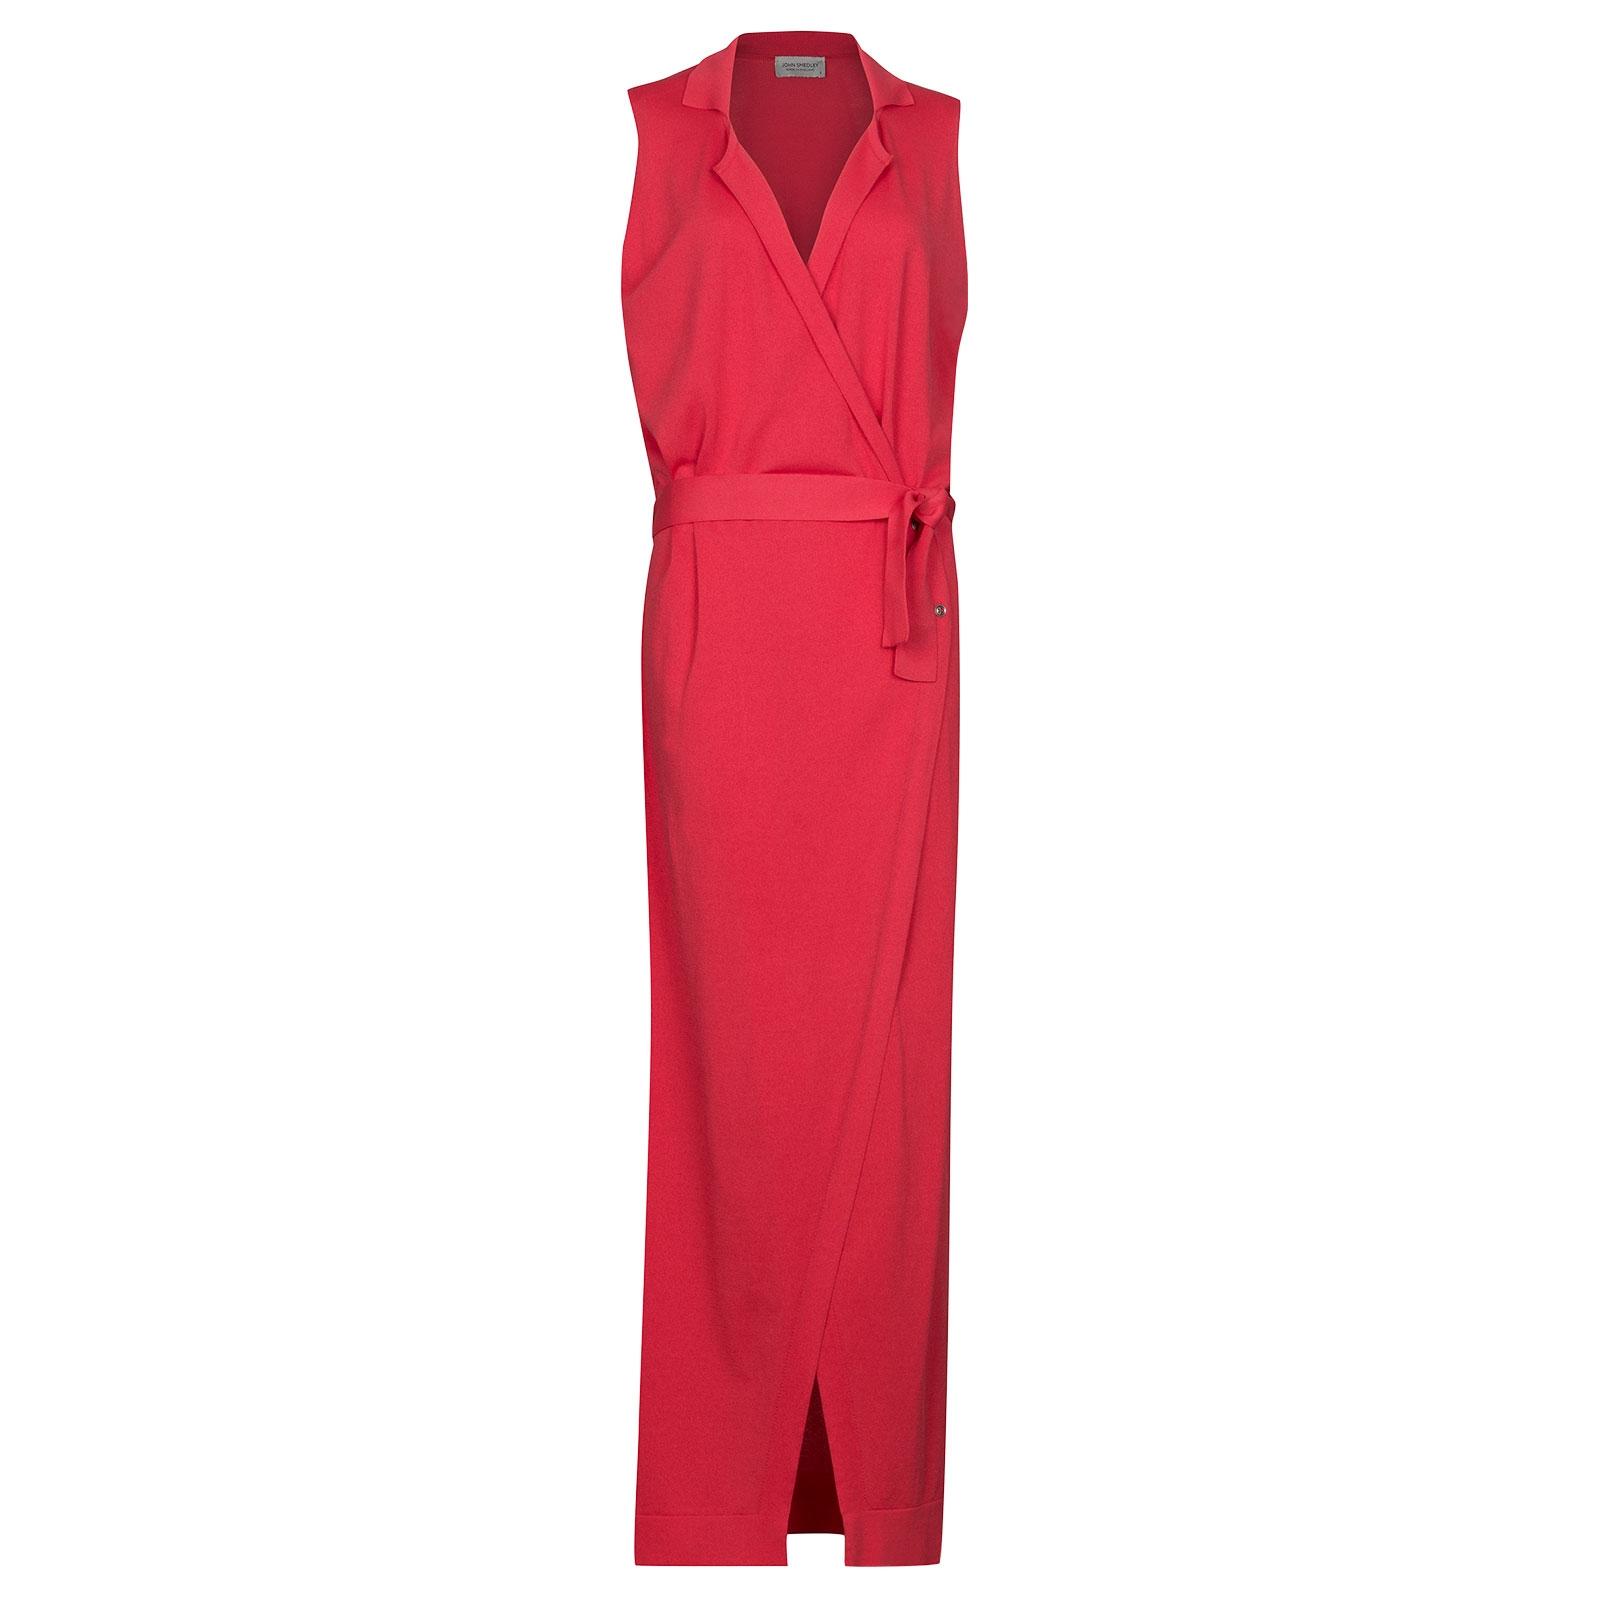 John Smedley Elwick Merino Wool Dress in Ruche Red-XL